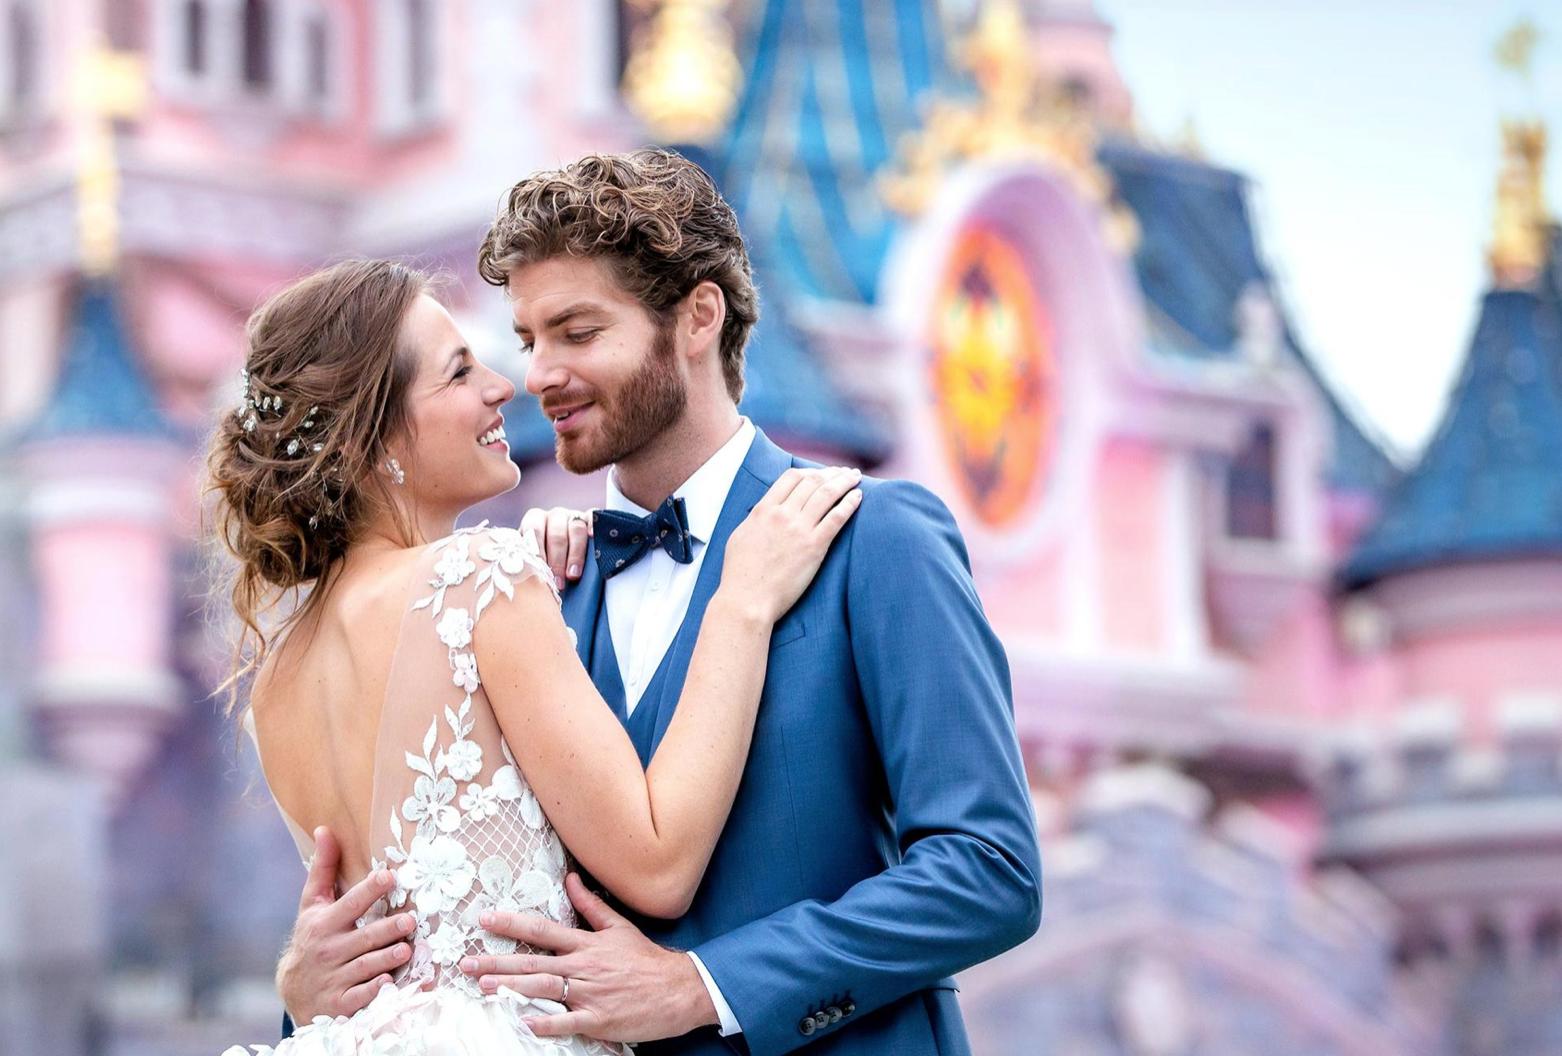 °o° Mariage de rêve chez Disney °o°